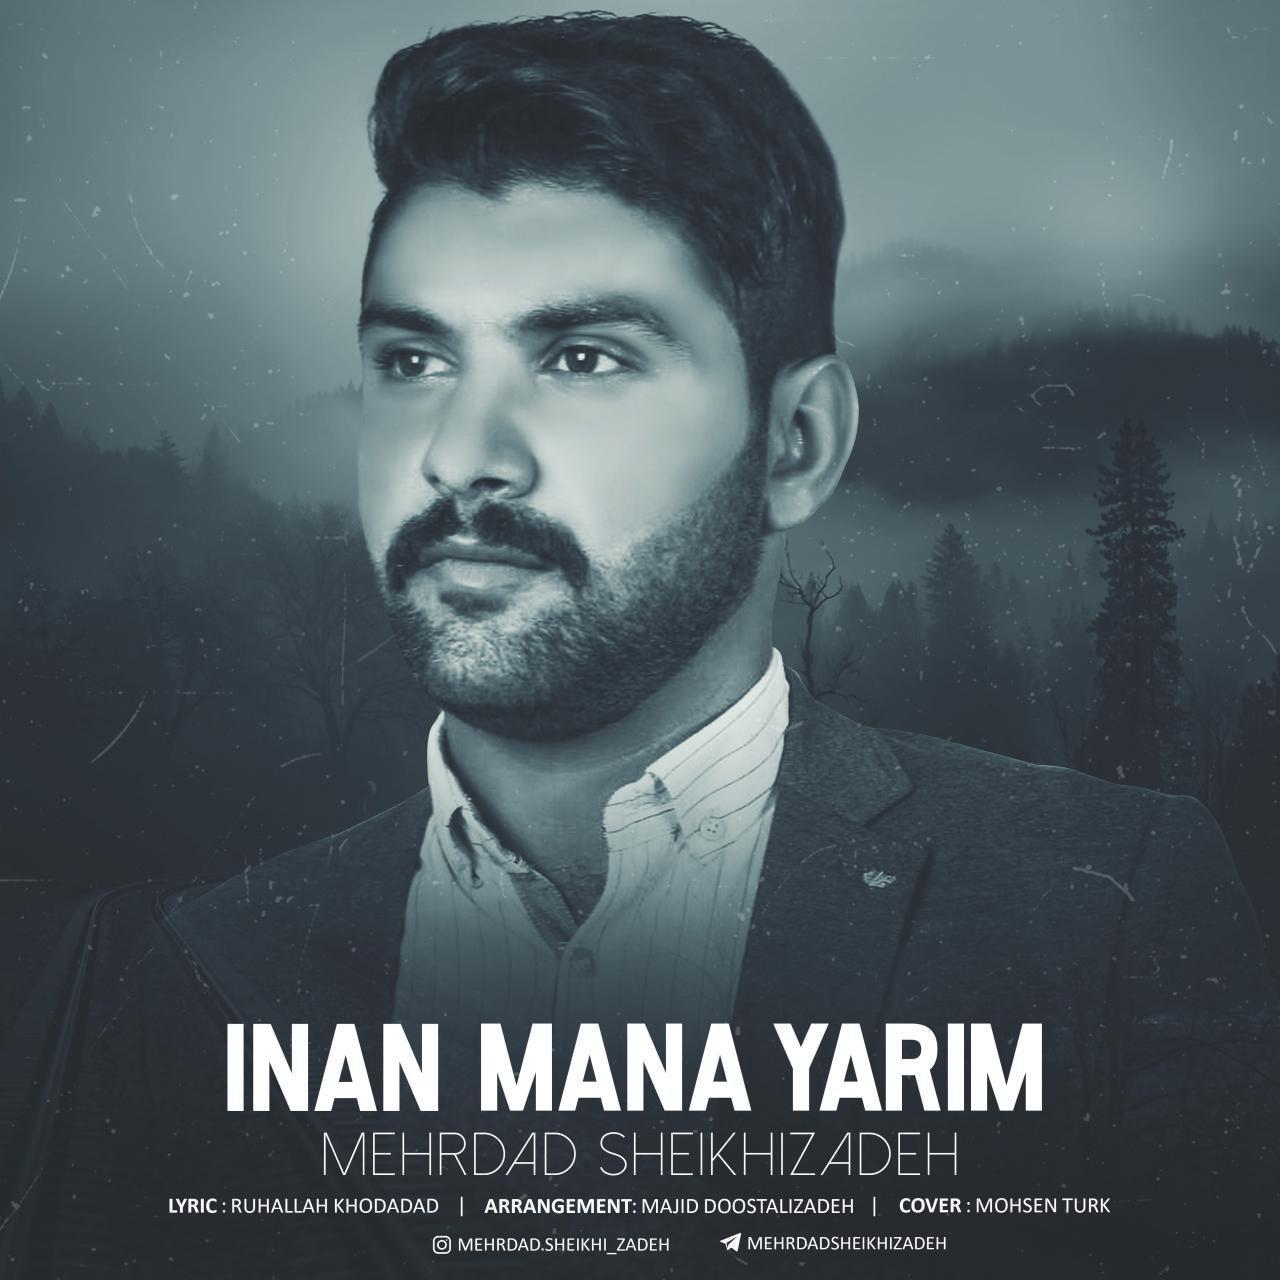 Mehrdad Sheikhizadeh - Inan Mana Yarim